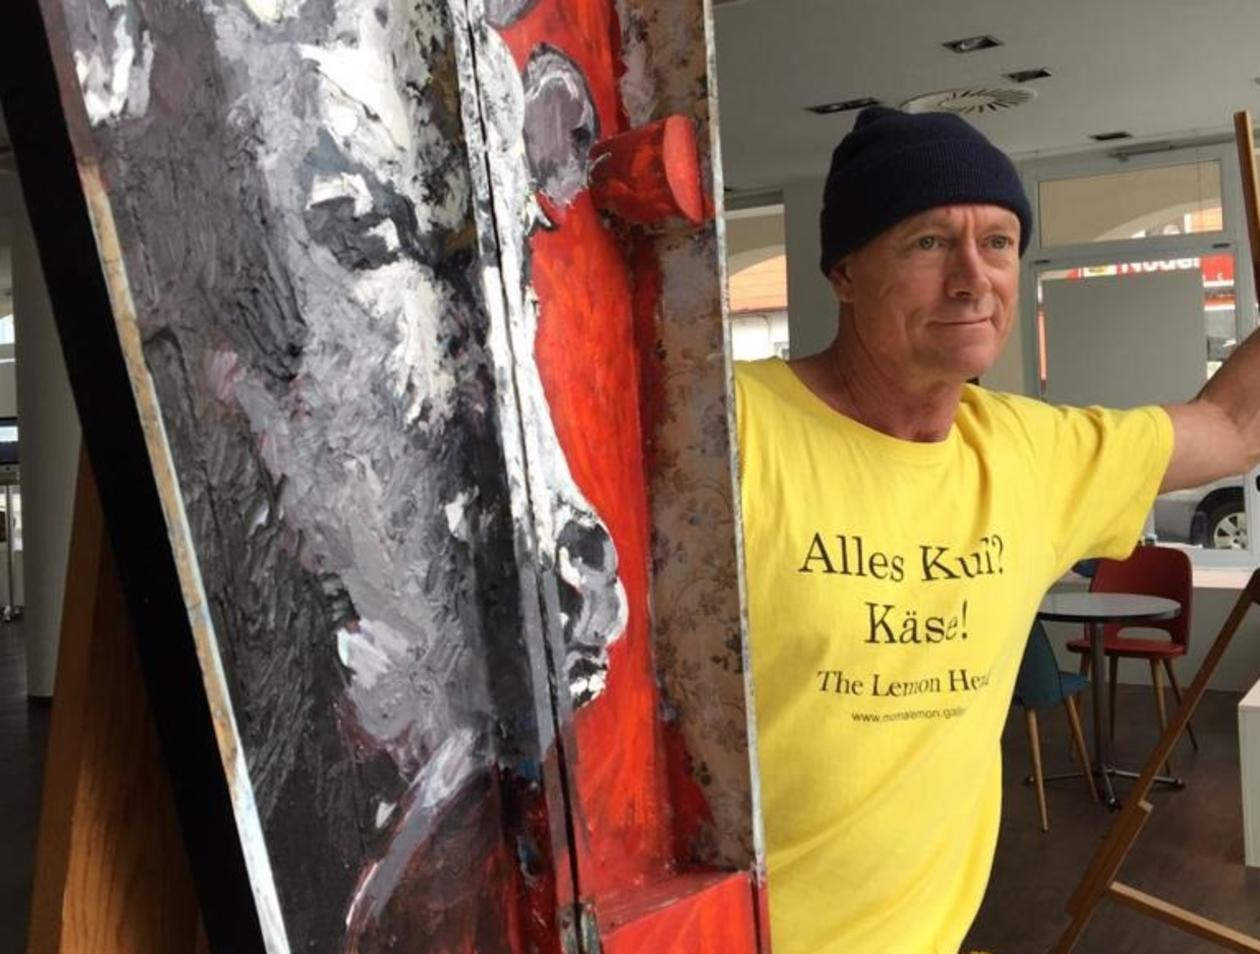 Pete Kilkenny Der Kuh Maler Aus Tittmoning Stellt In Waging Aus